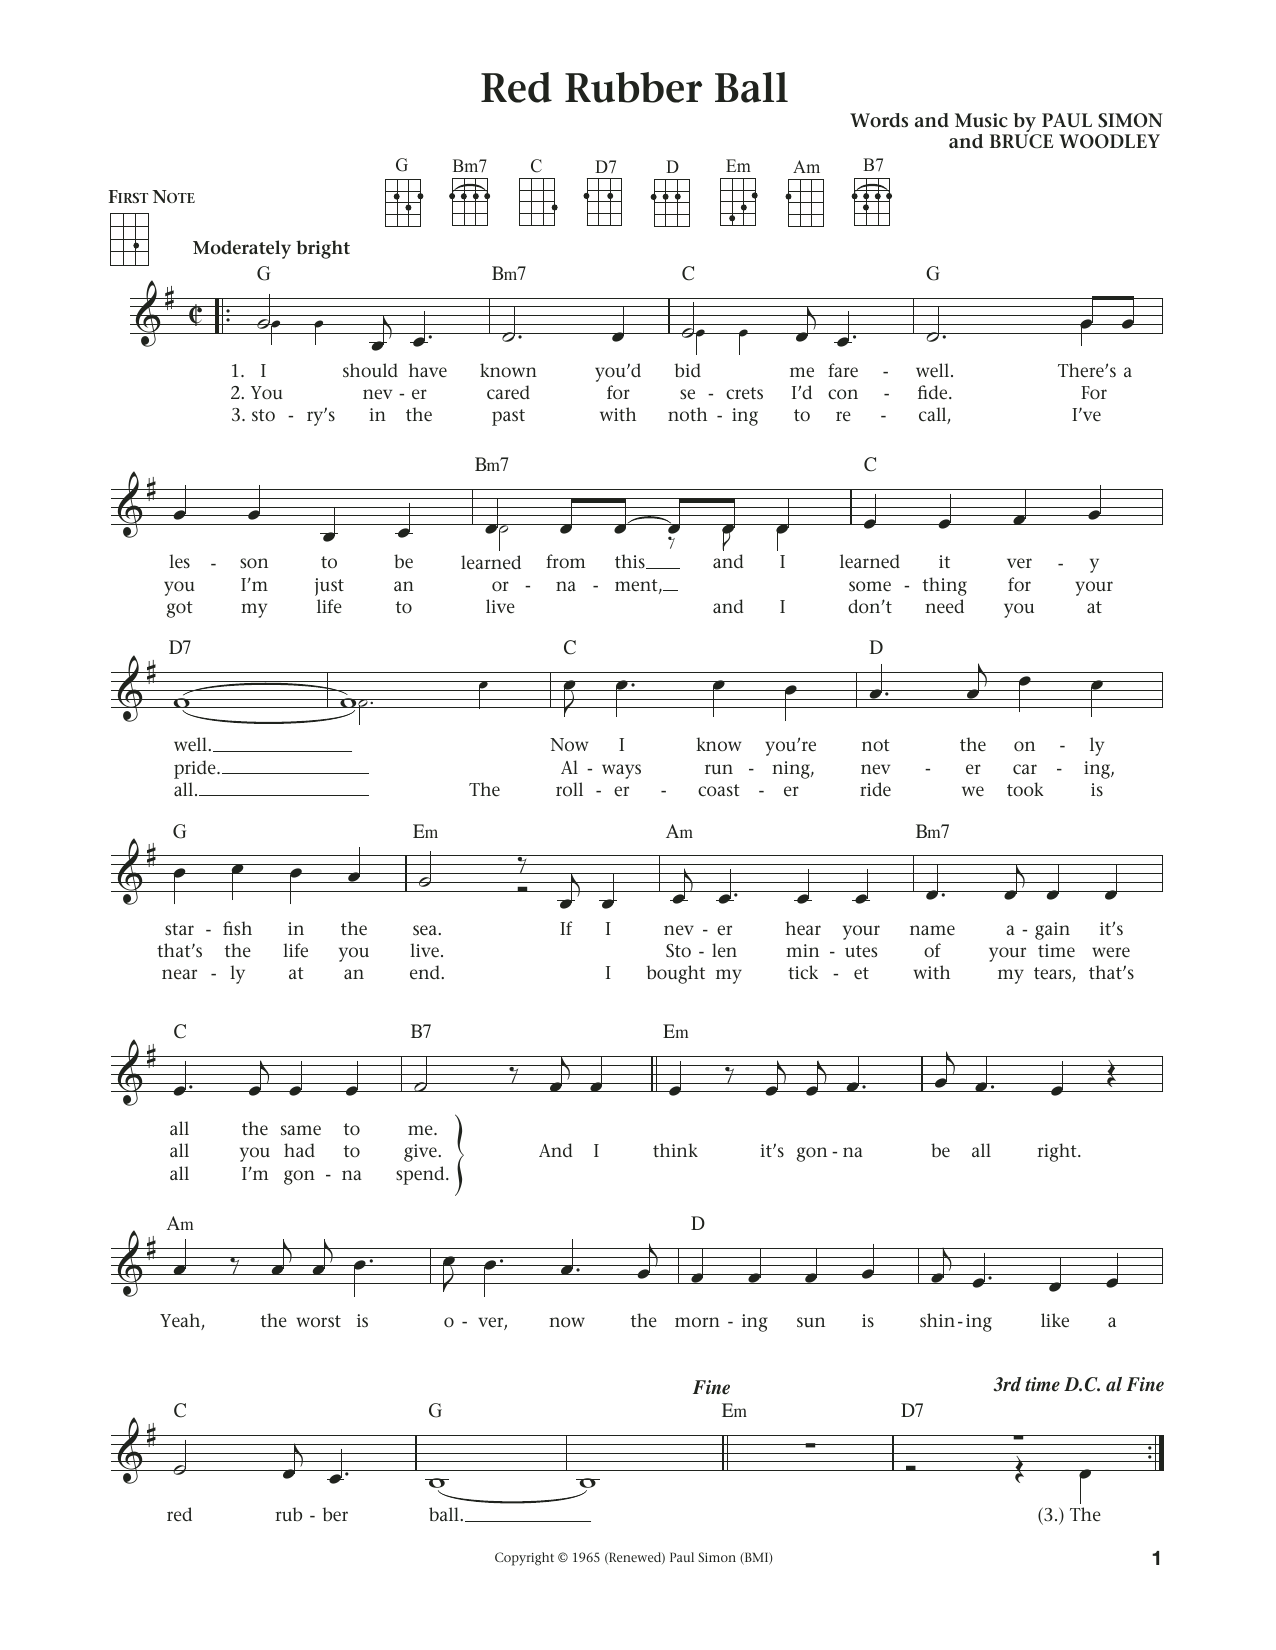 Sheet Music Digital Files To Print - Licensed Paul Simon